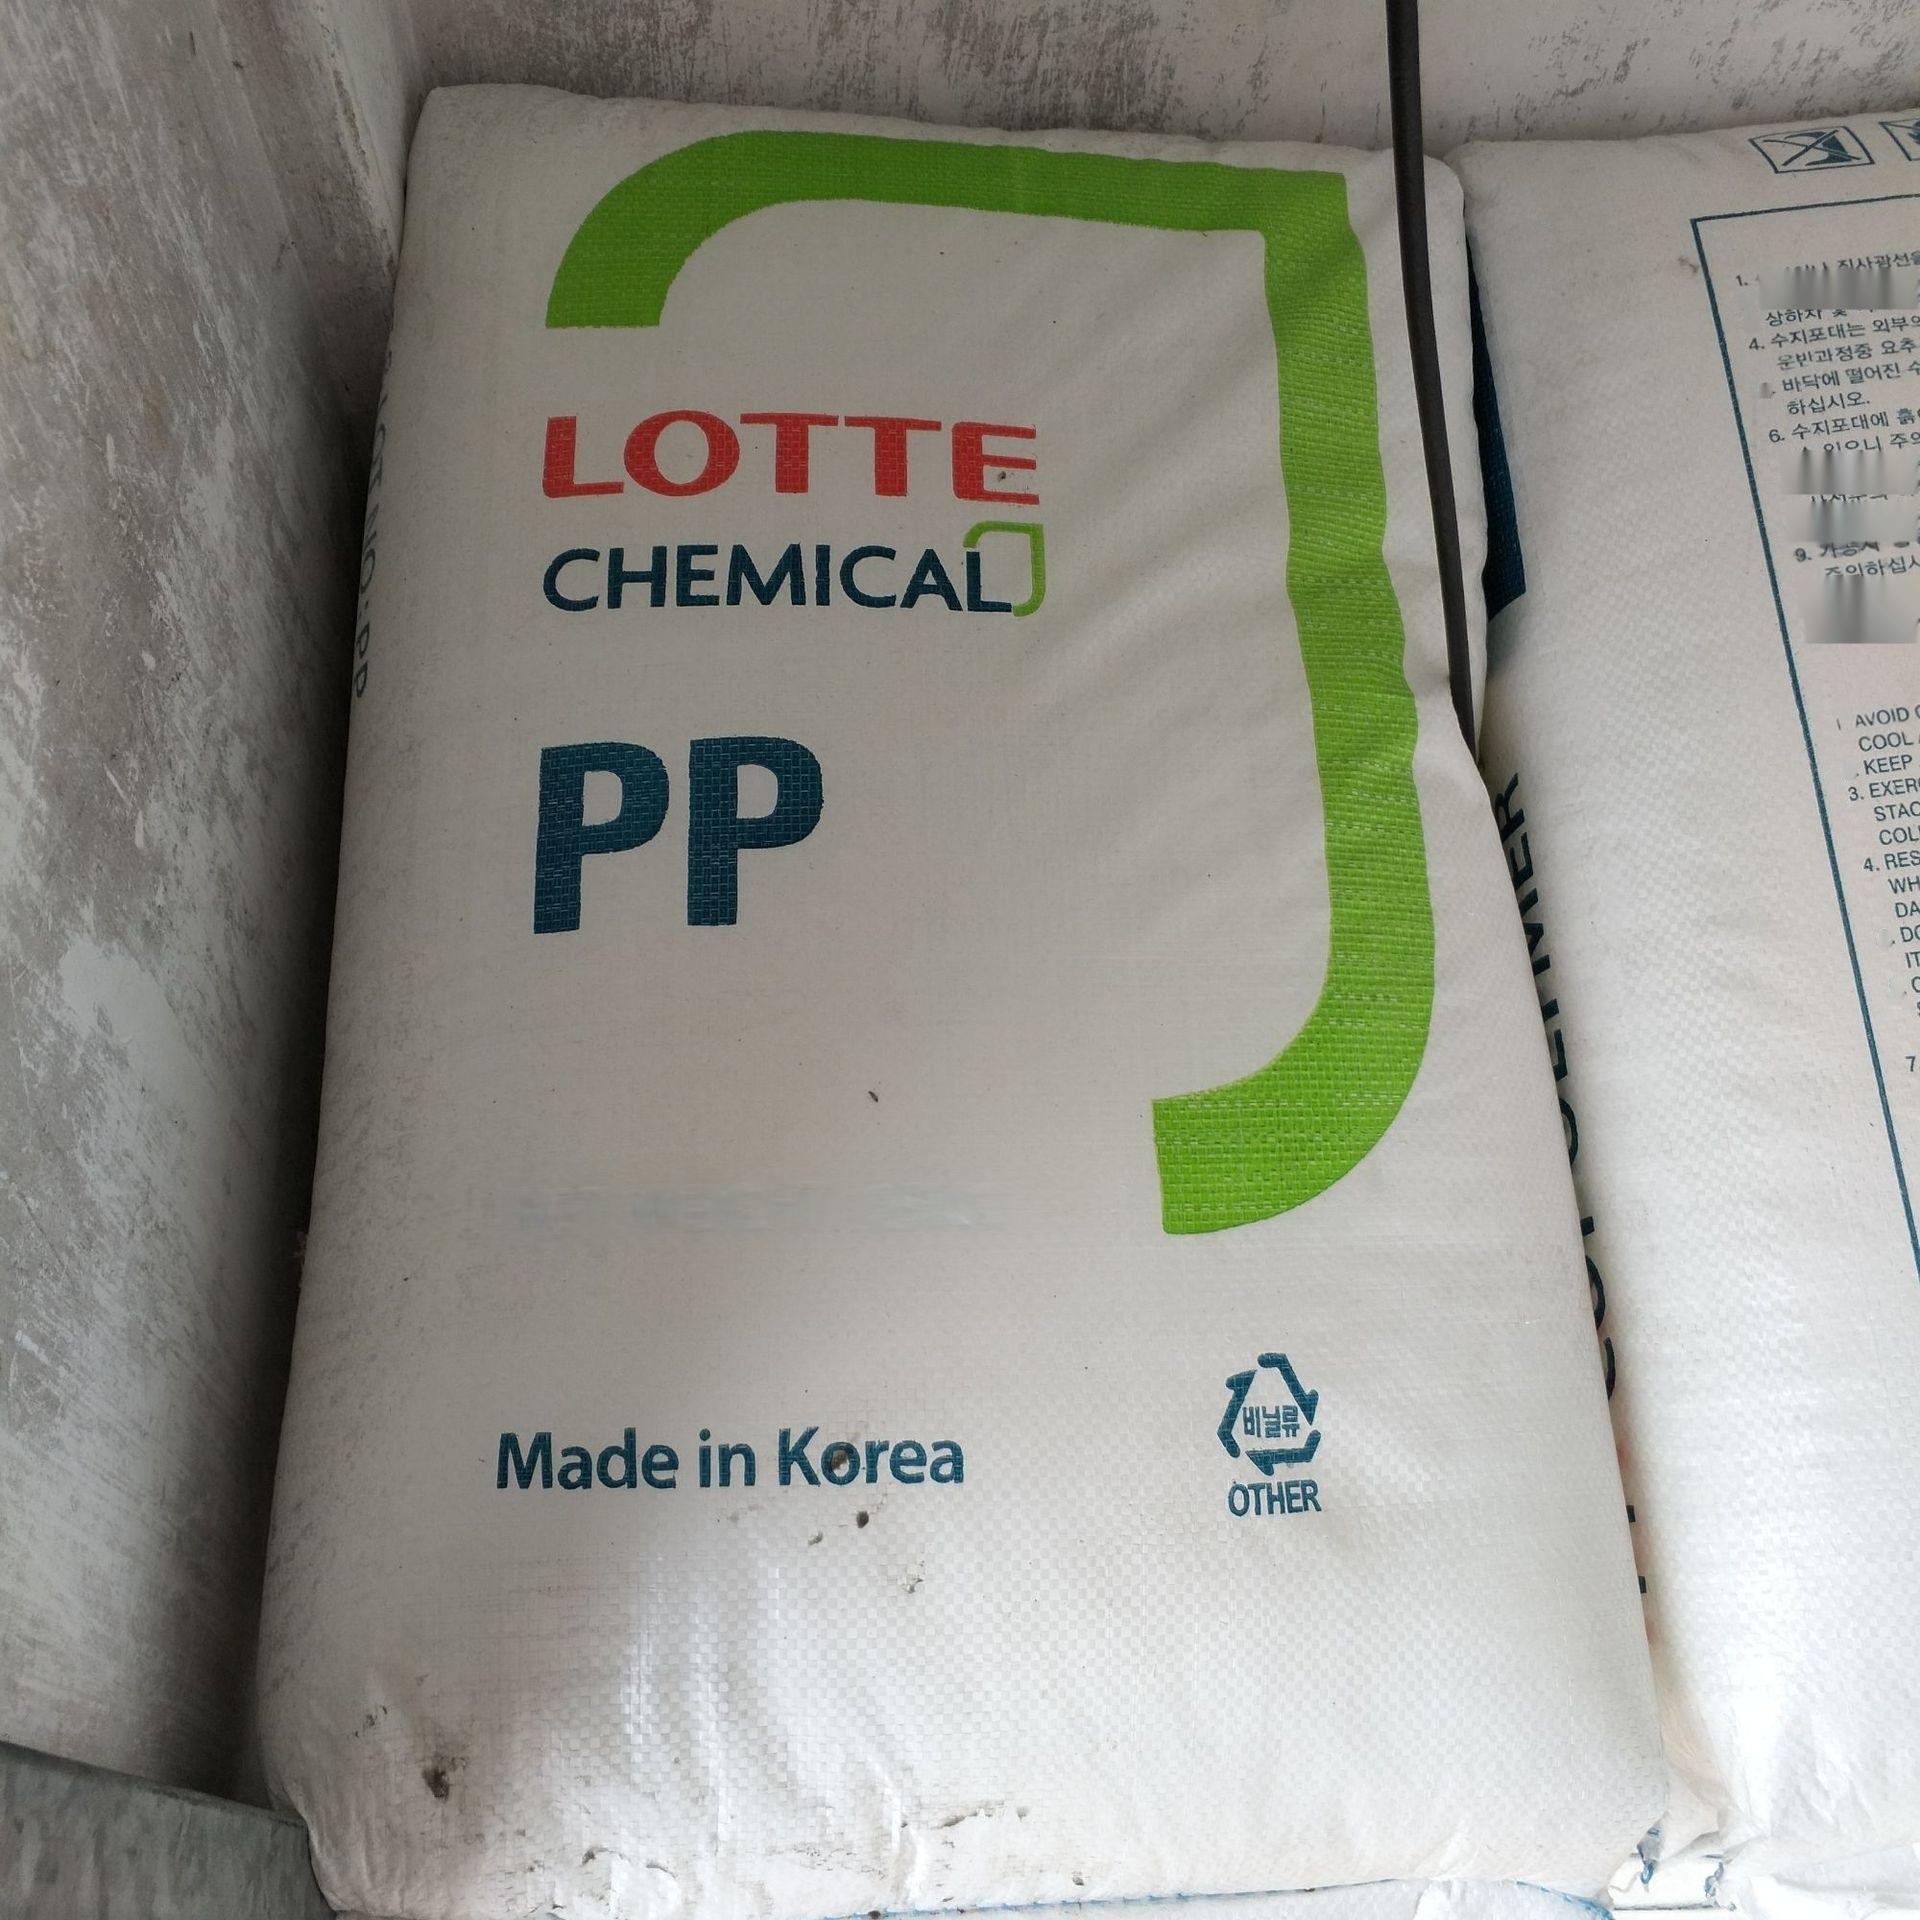 PP 韩国乐天化学 SFC-750R 正面图